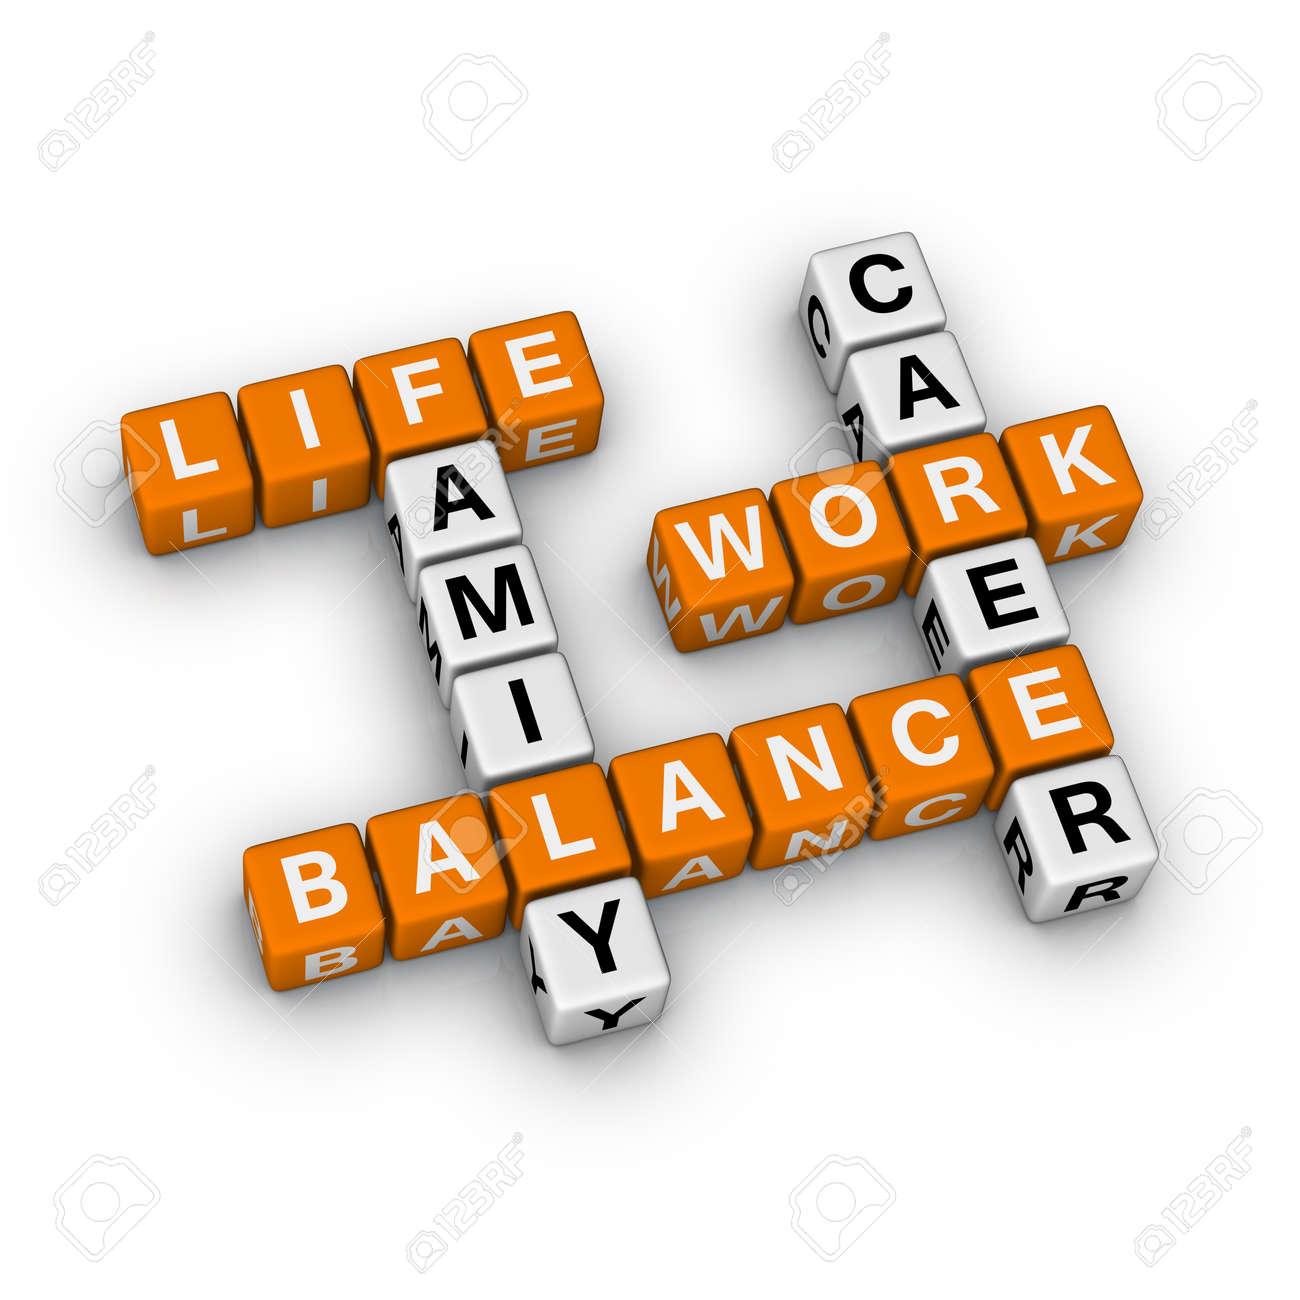 Work and Life Balance (3D crossword orange series) - 8773221